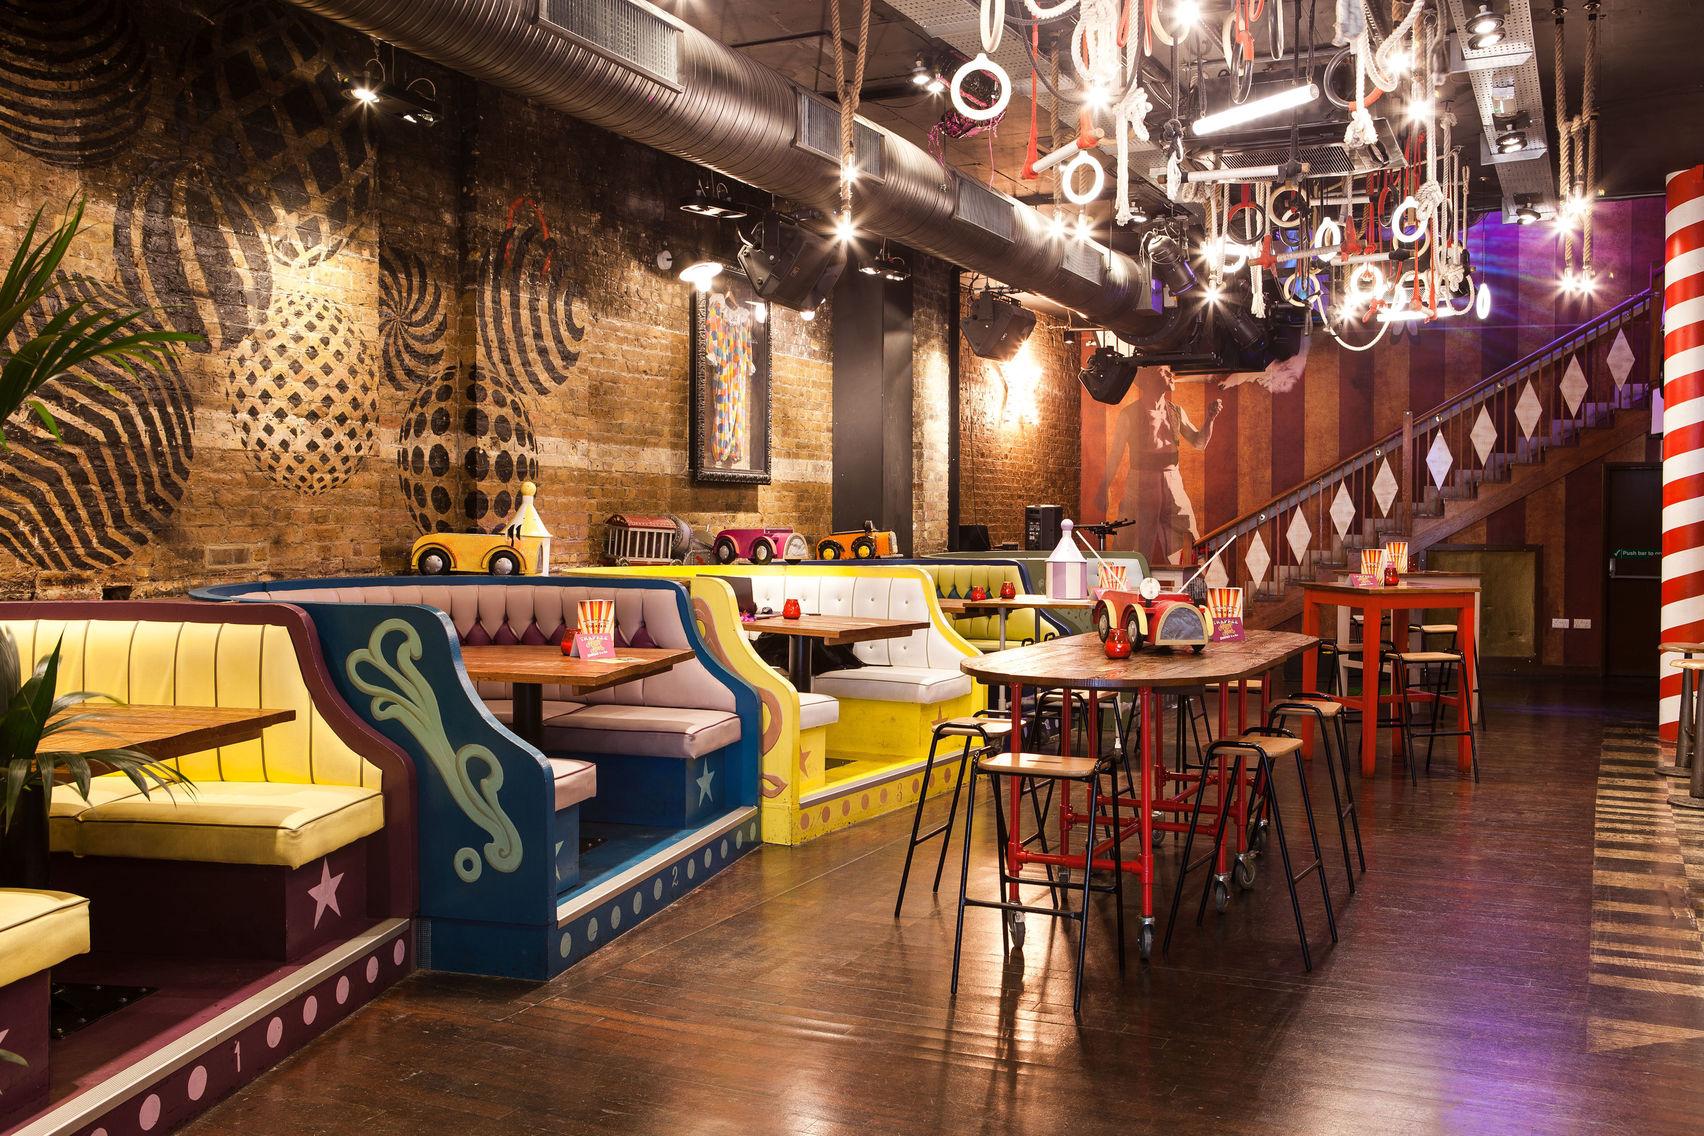 A bar with a circus theme